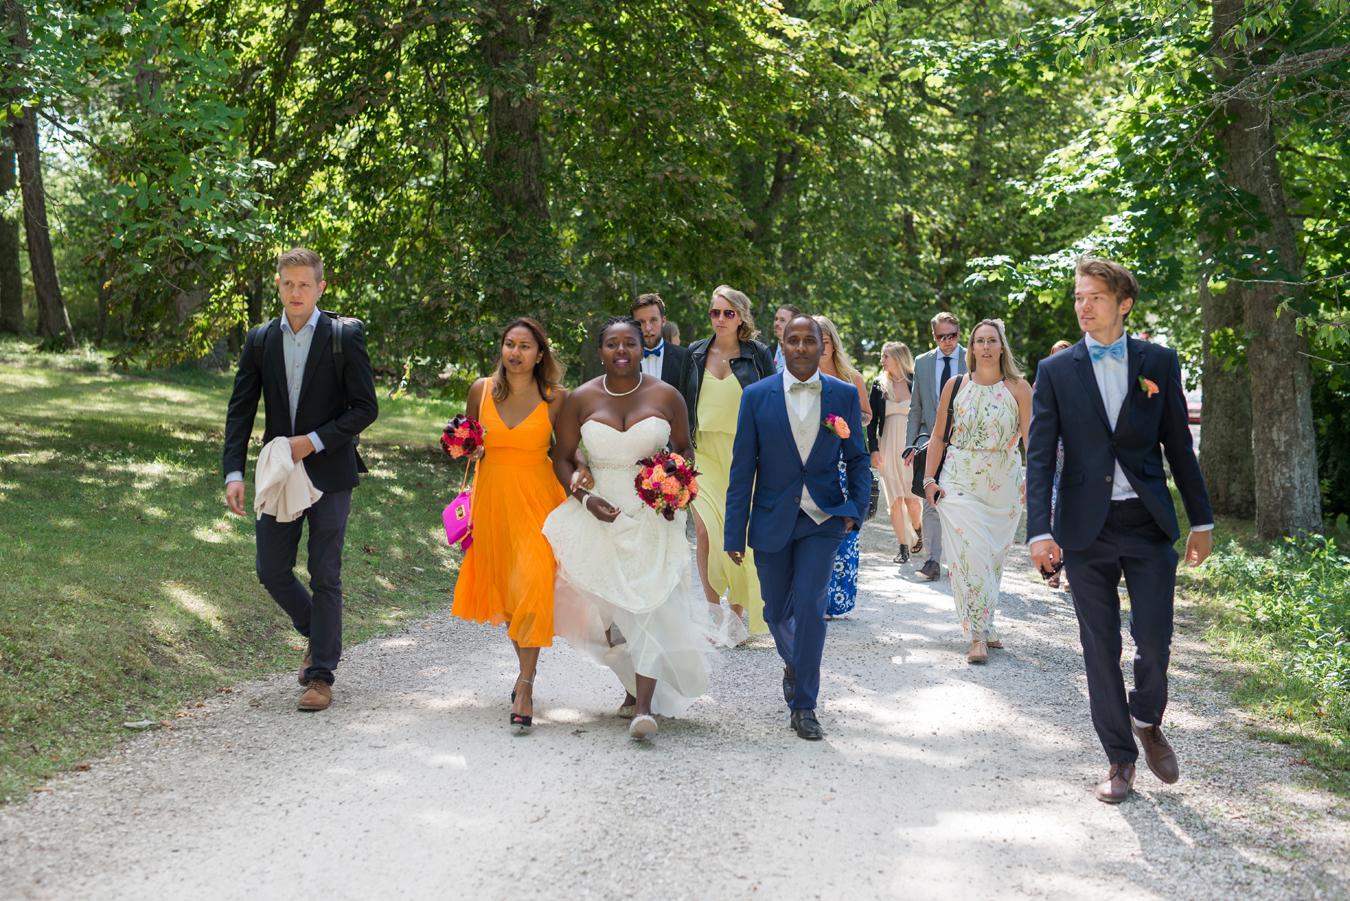 011-bröllop-gotland-fridhem-neas-fotografi.jpg